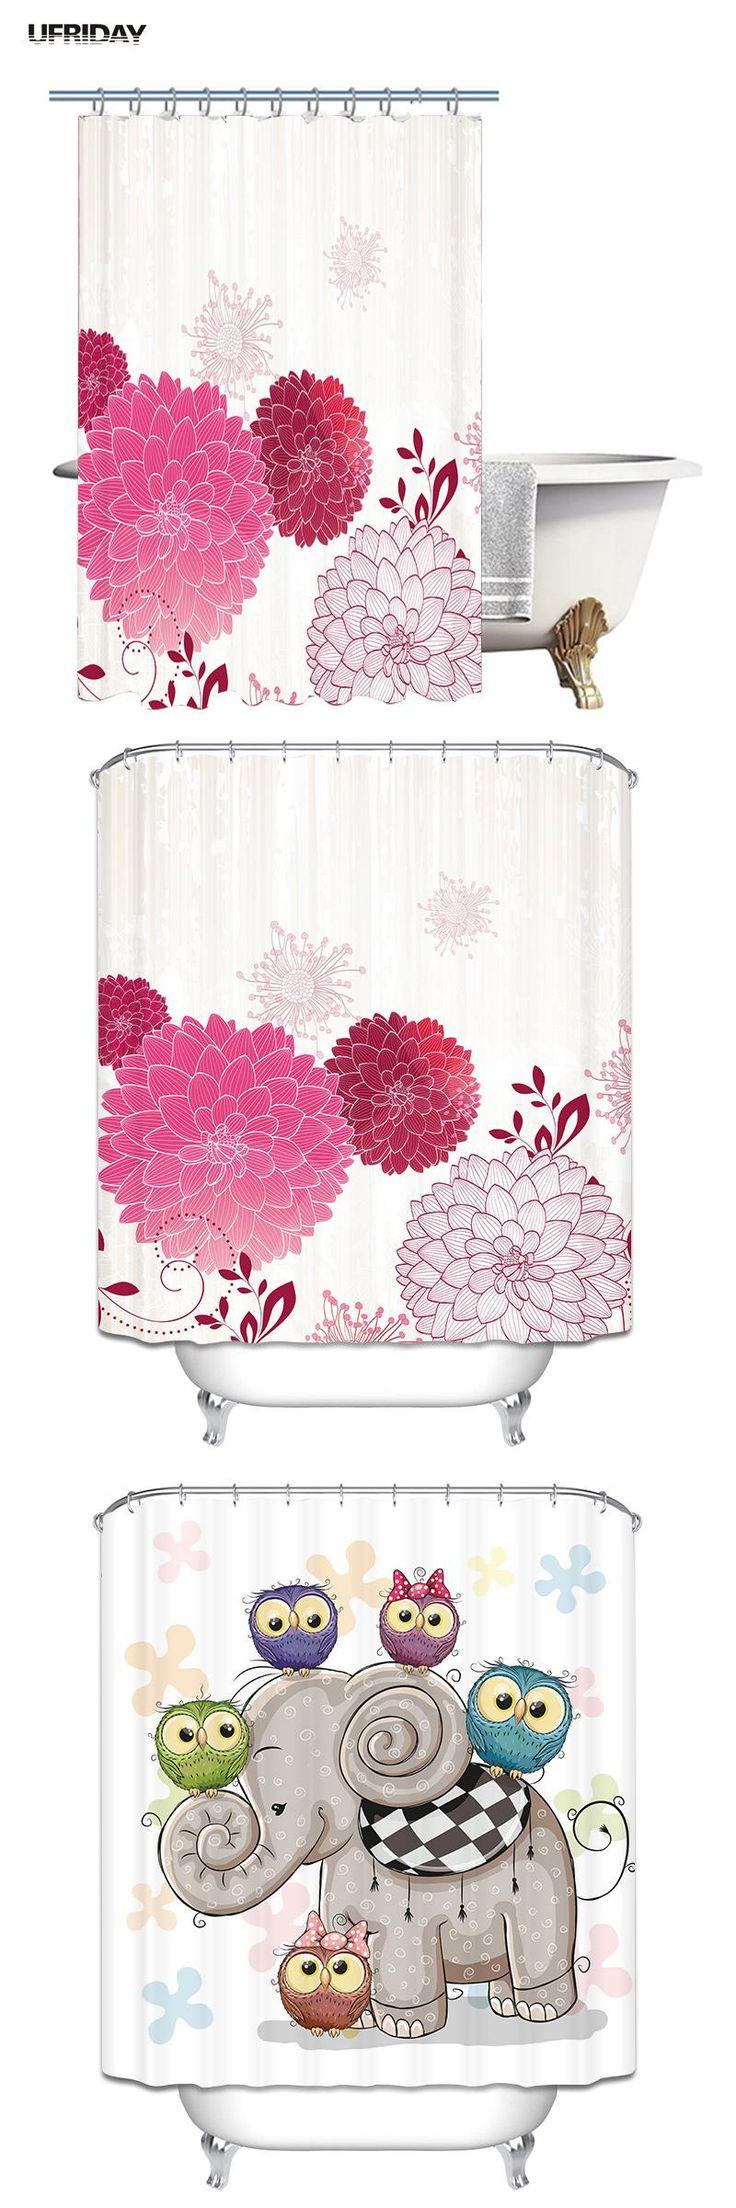 [Visit to Buy] UFRIDAY 3D Shower Curtain Flowers Tree Leaves Elephant Paint Waterproof Cortinas Floral Design 3D Shower Curtains Bath Curtains #Advertisement